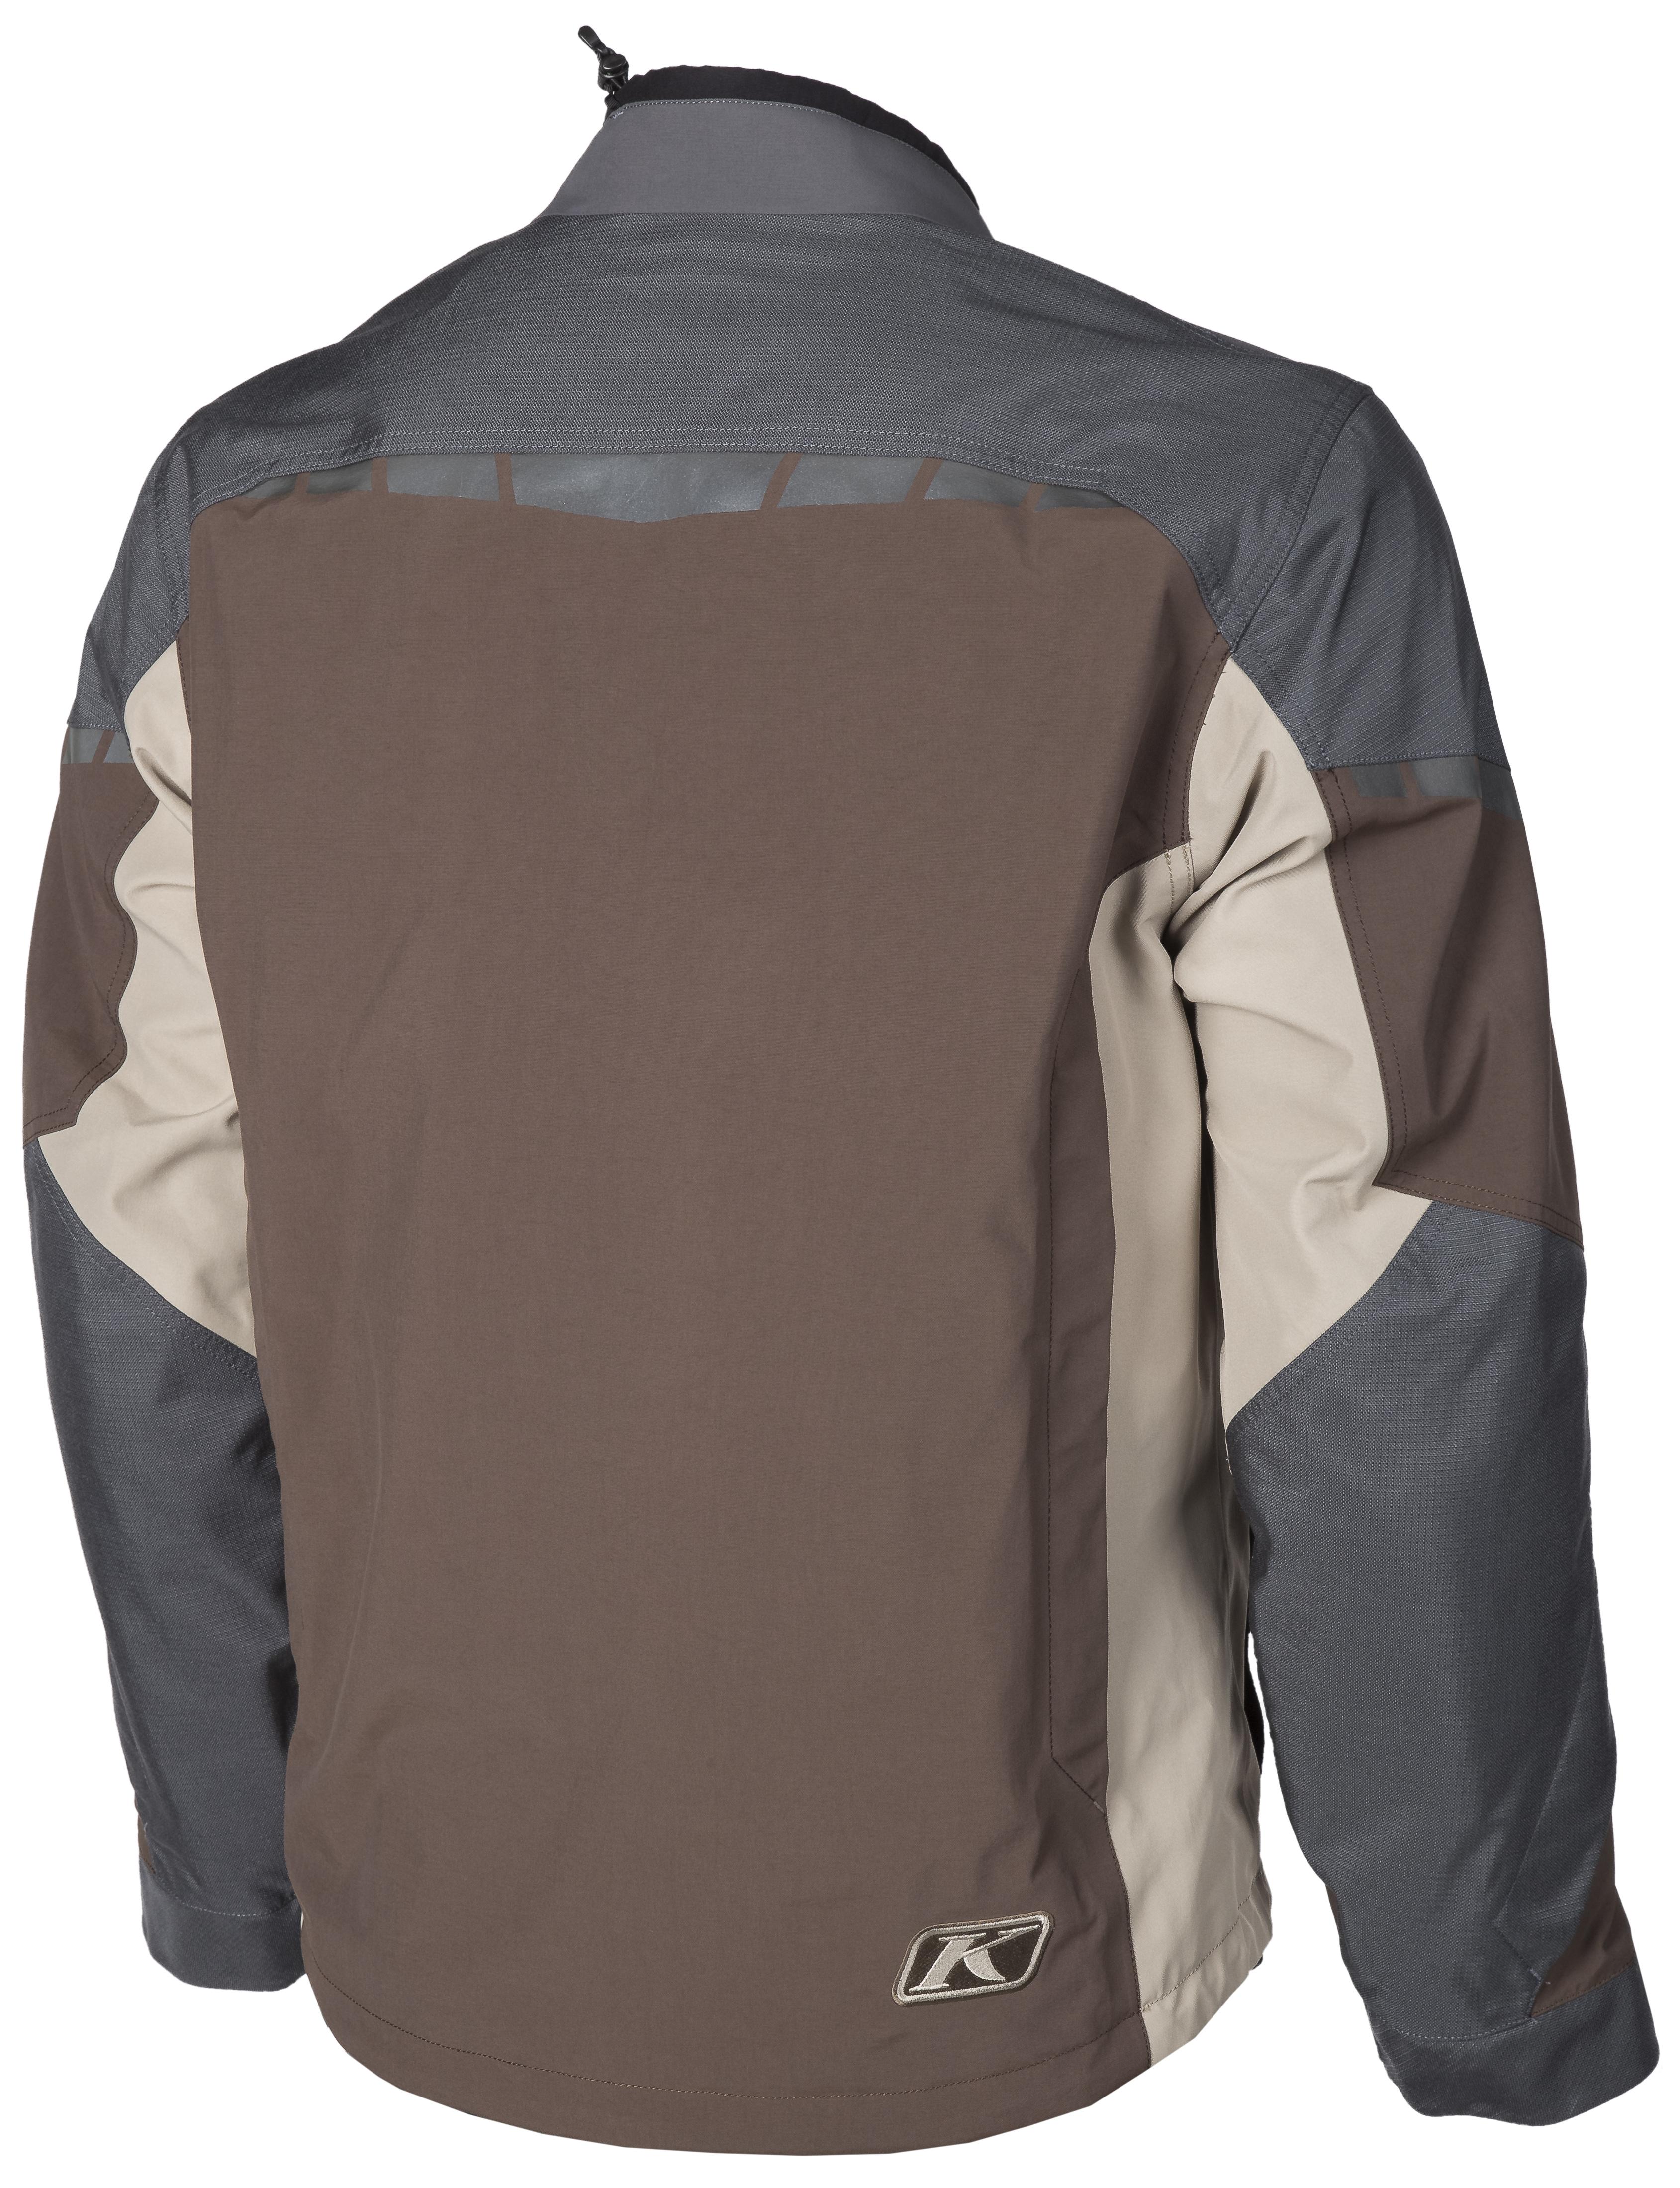 3906-000-900 Carlsbad Jacket D1